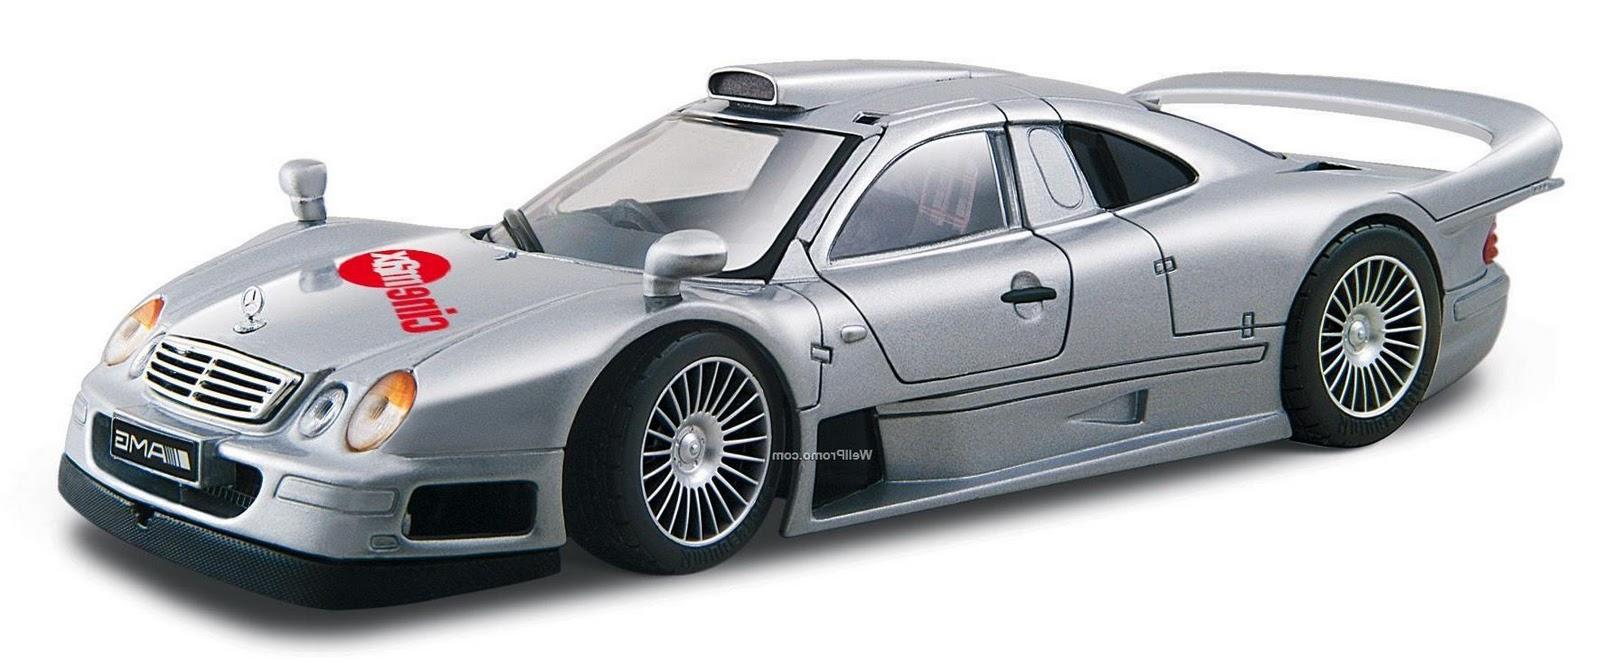 Silver Mercedes Clk-gtr